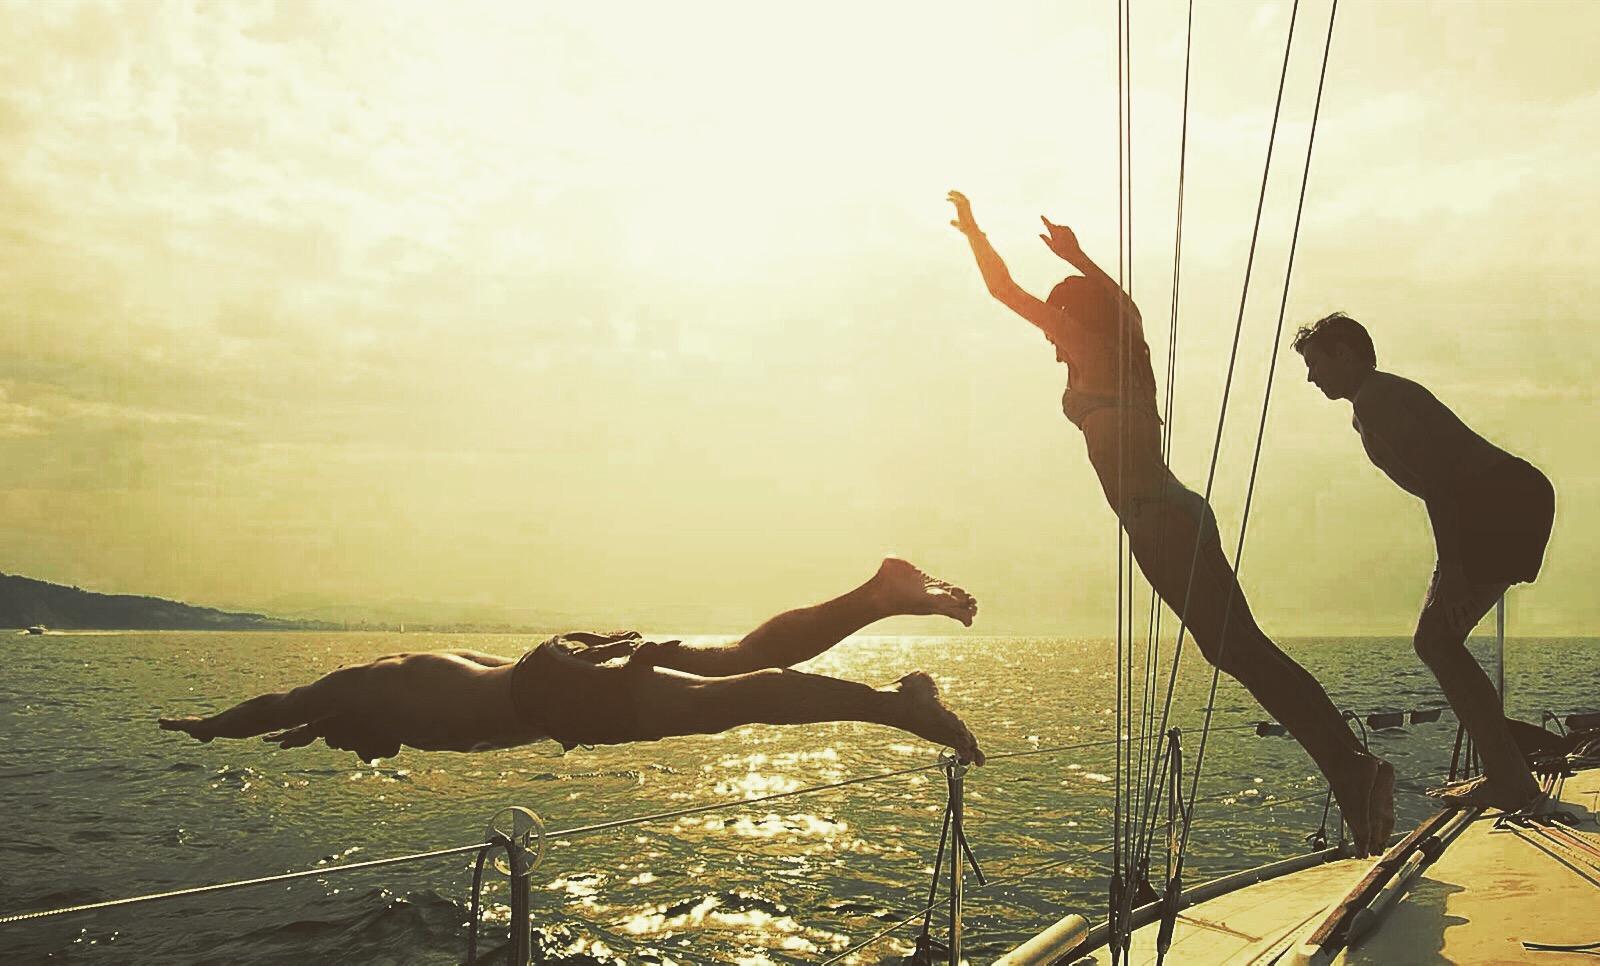 Yanpy Post 140 Summer Friends Sailboat